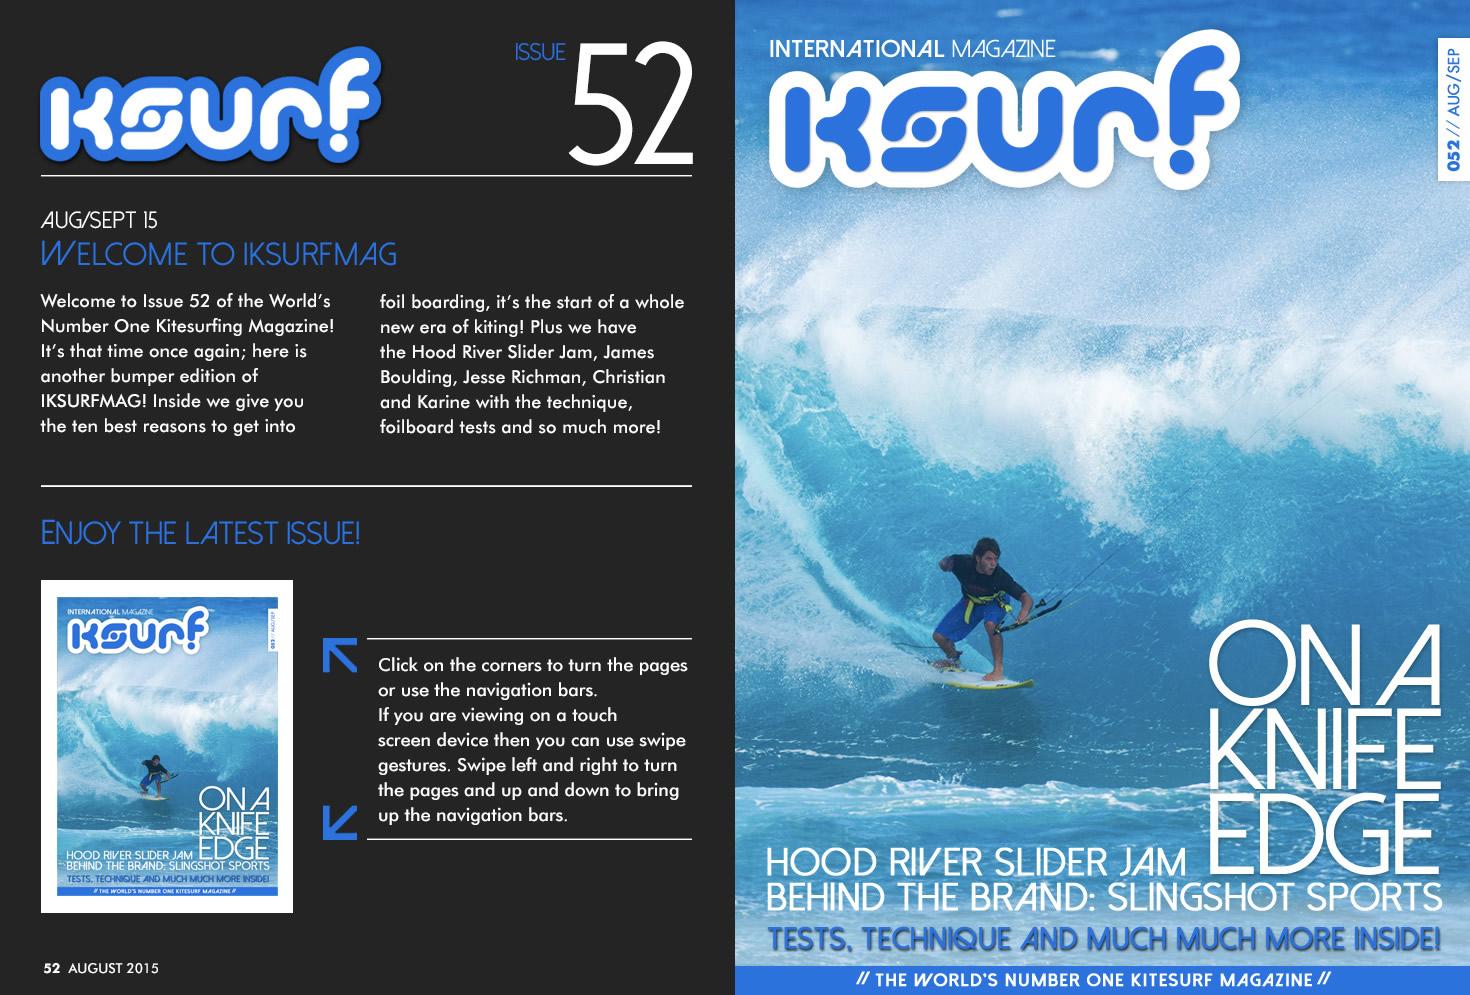 iksurfmag 52